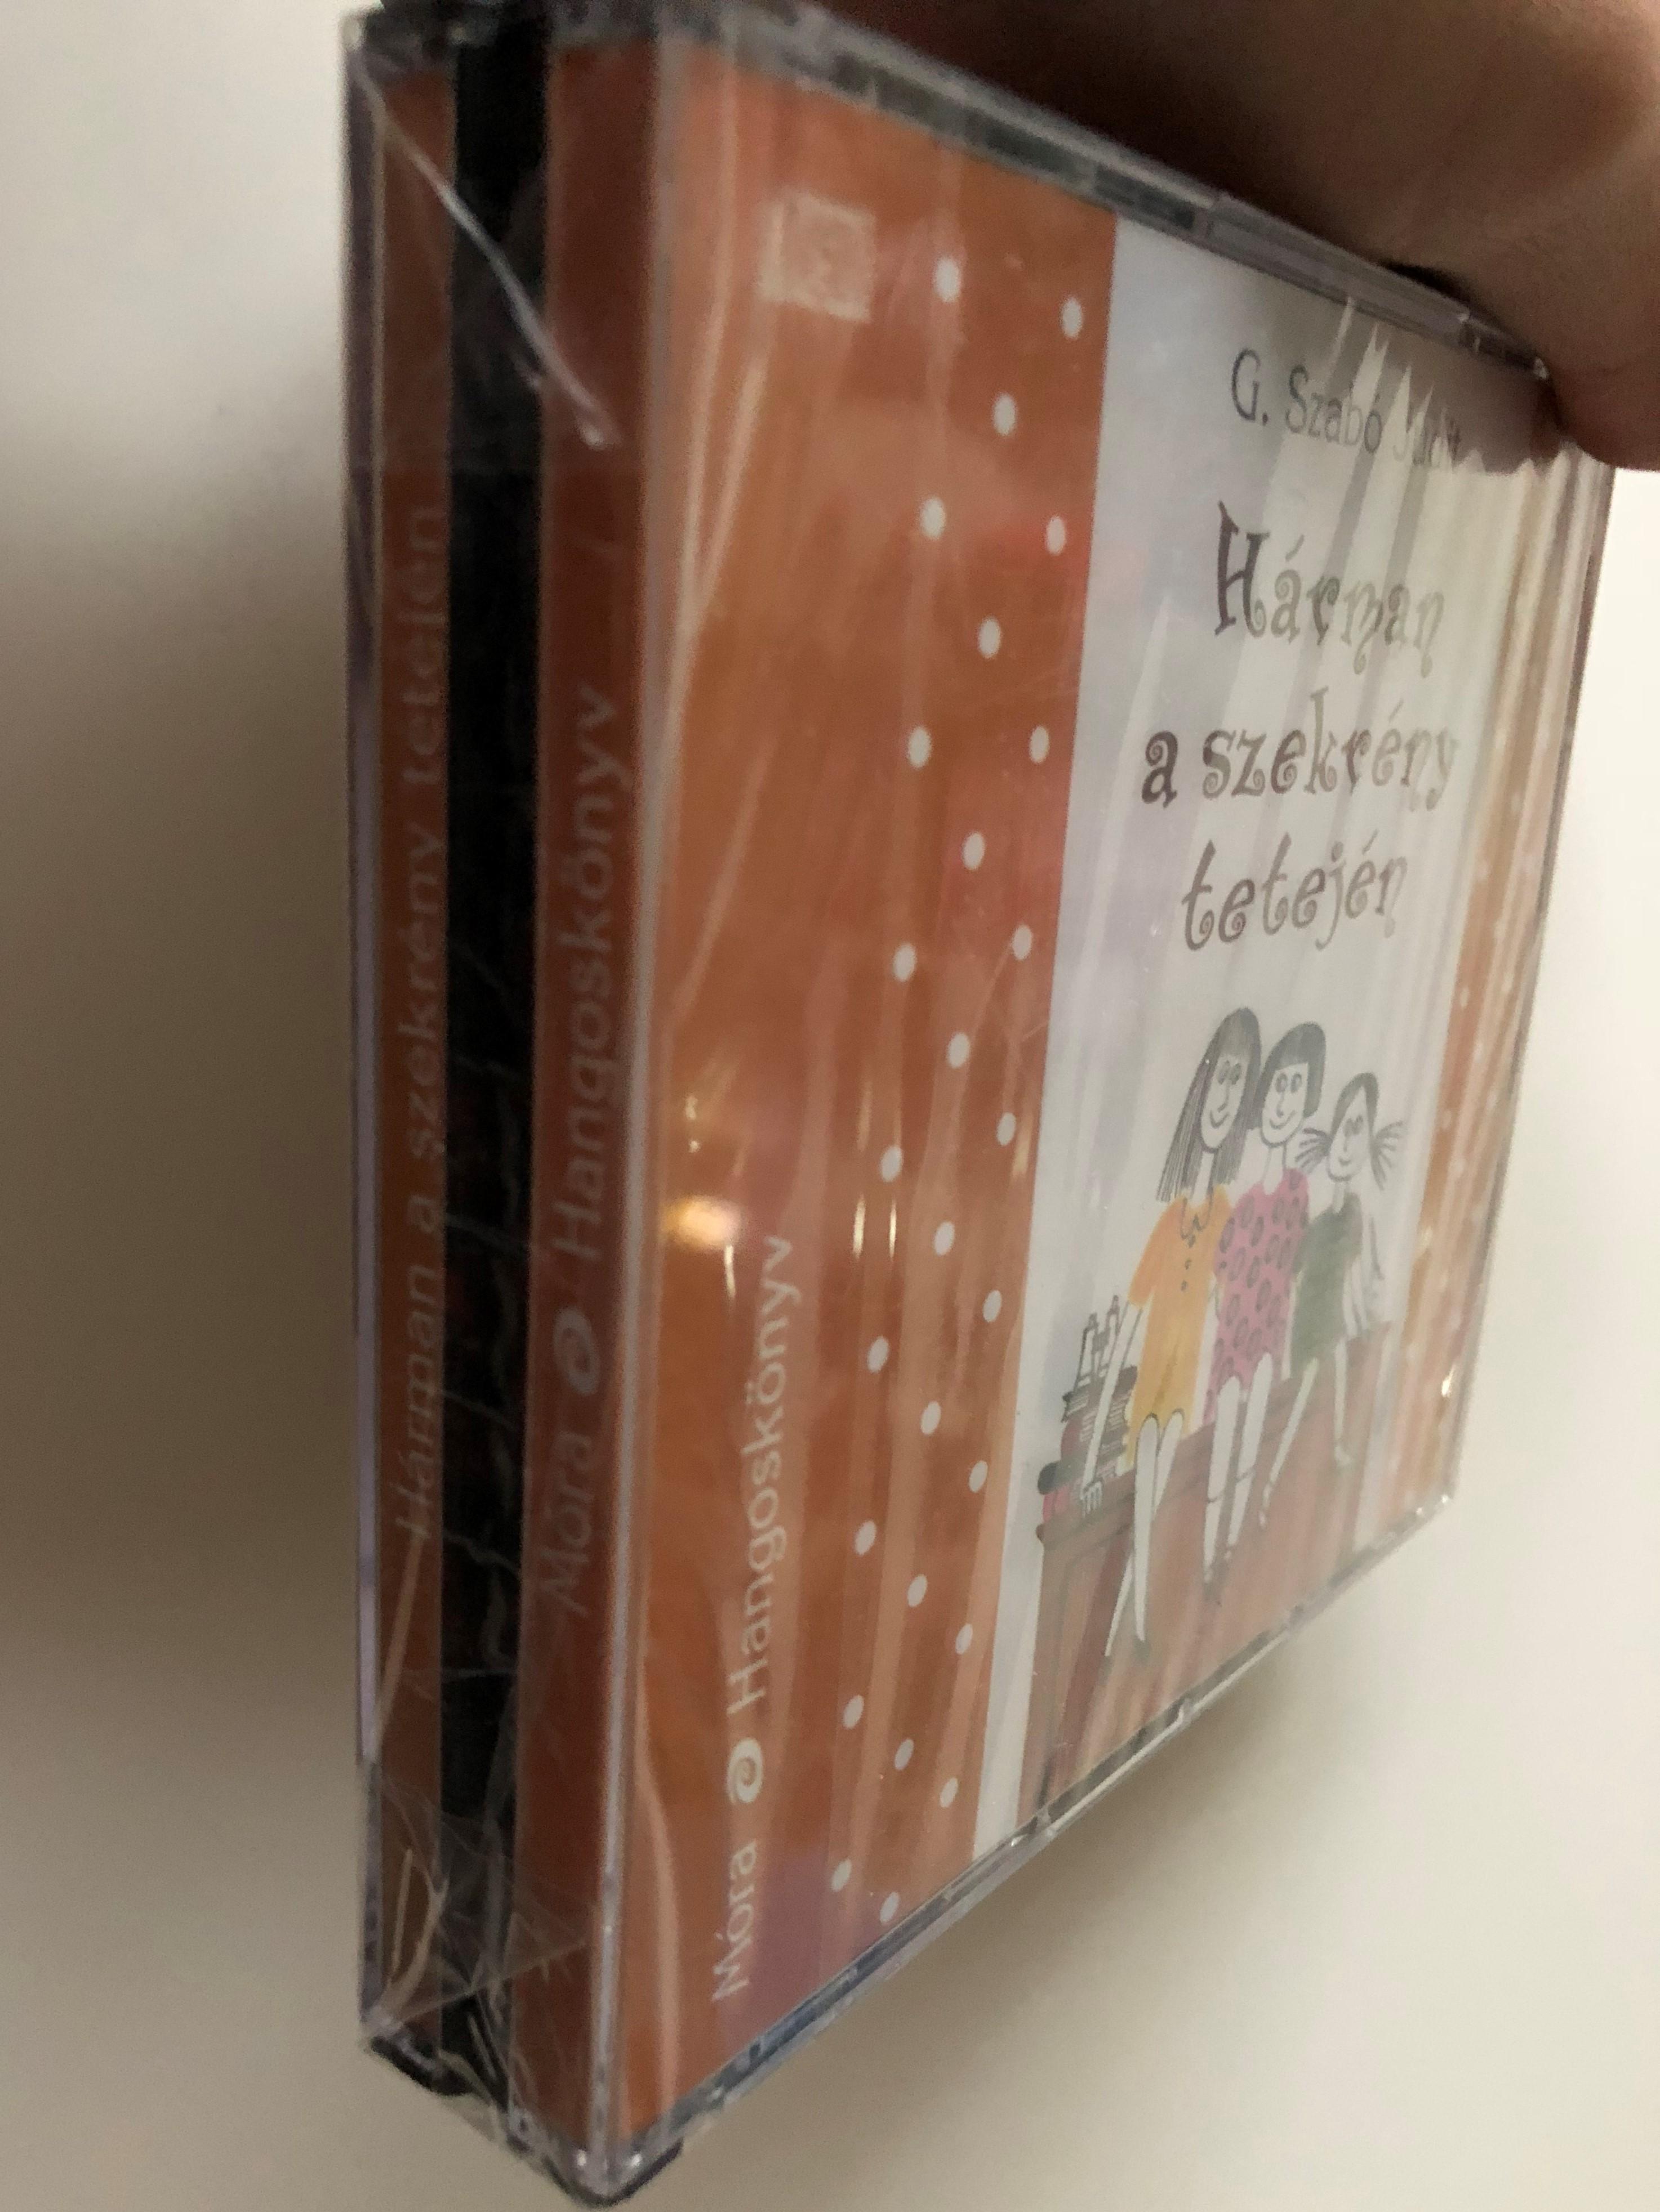 h-rman-a-szekr-ny-tetej-n-by-g.-szab-judit-hungarian-language-audio-book-read-by-zakari-s-va-4x-audio-cd-set-m-ra-k-nyvkiad-2008-2-.jpg